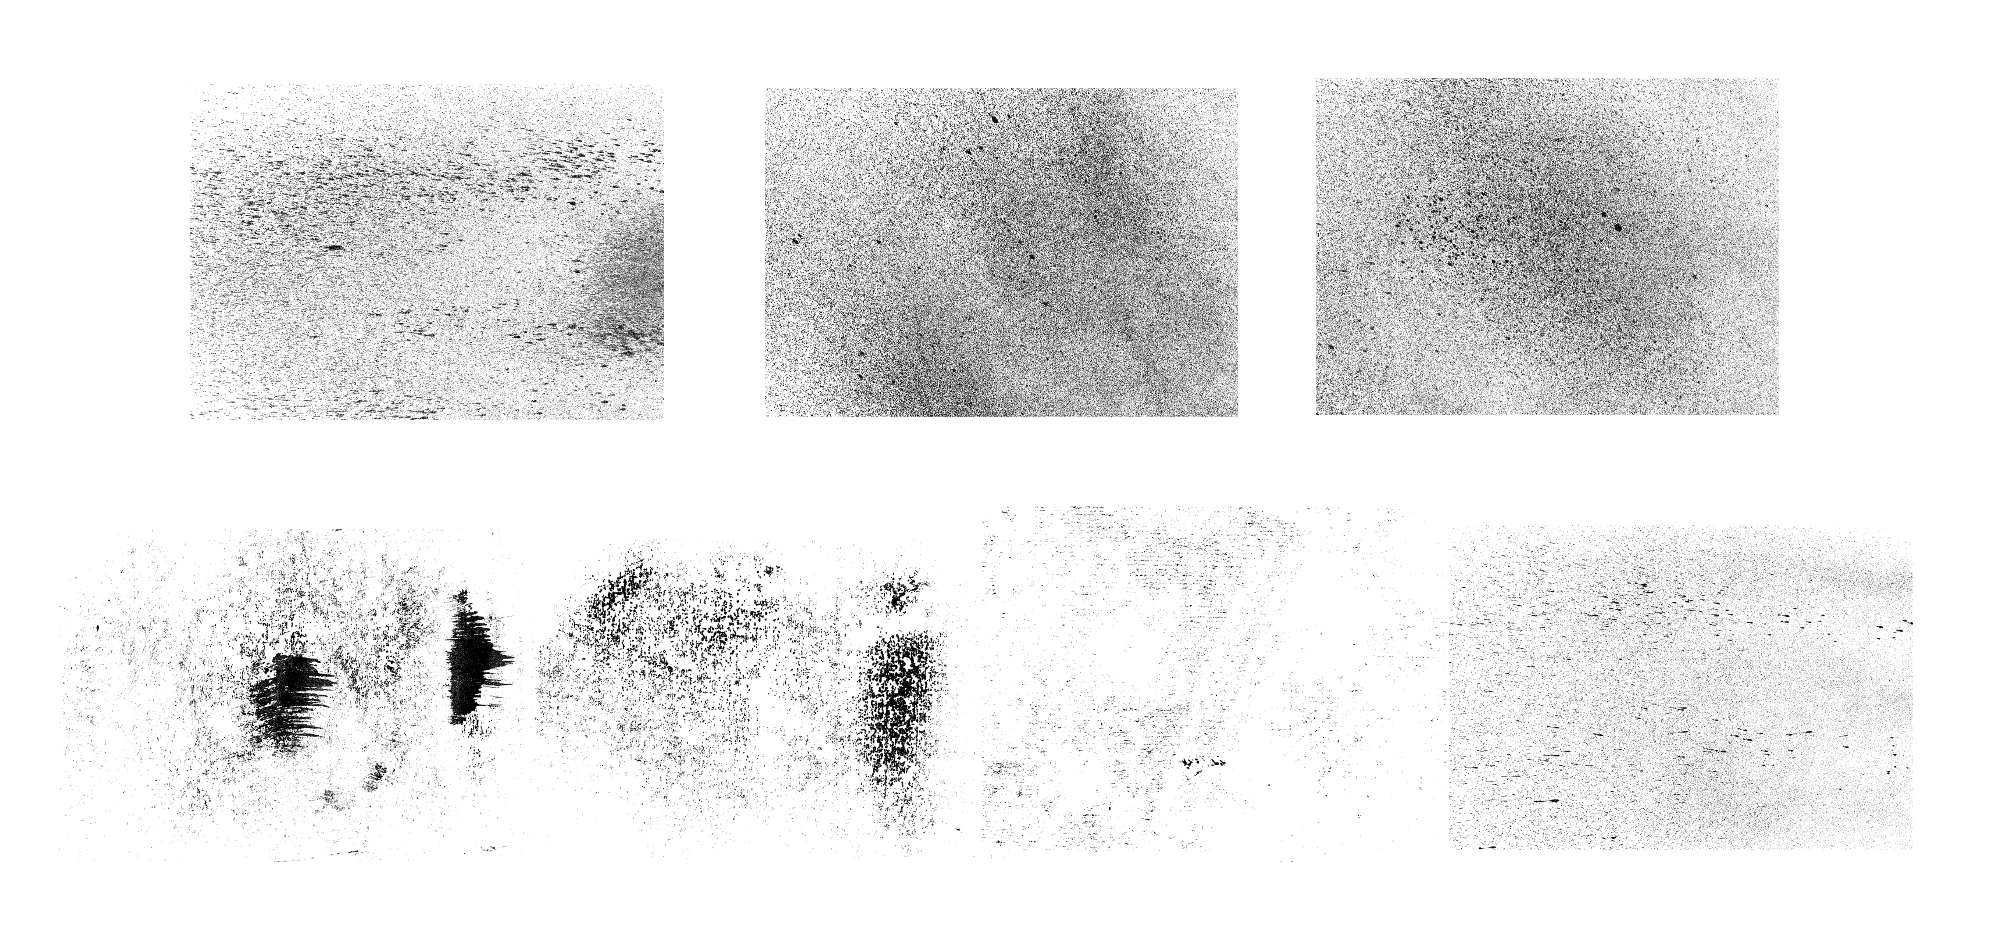 7-noise-texture-overlays-cover.jpg